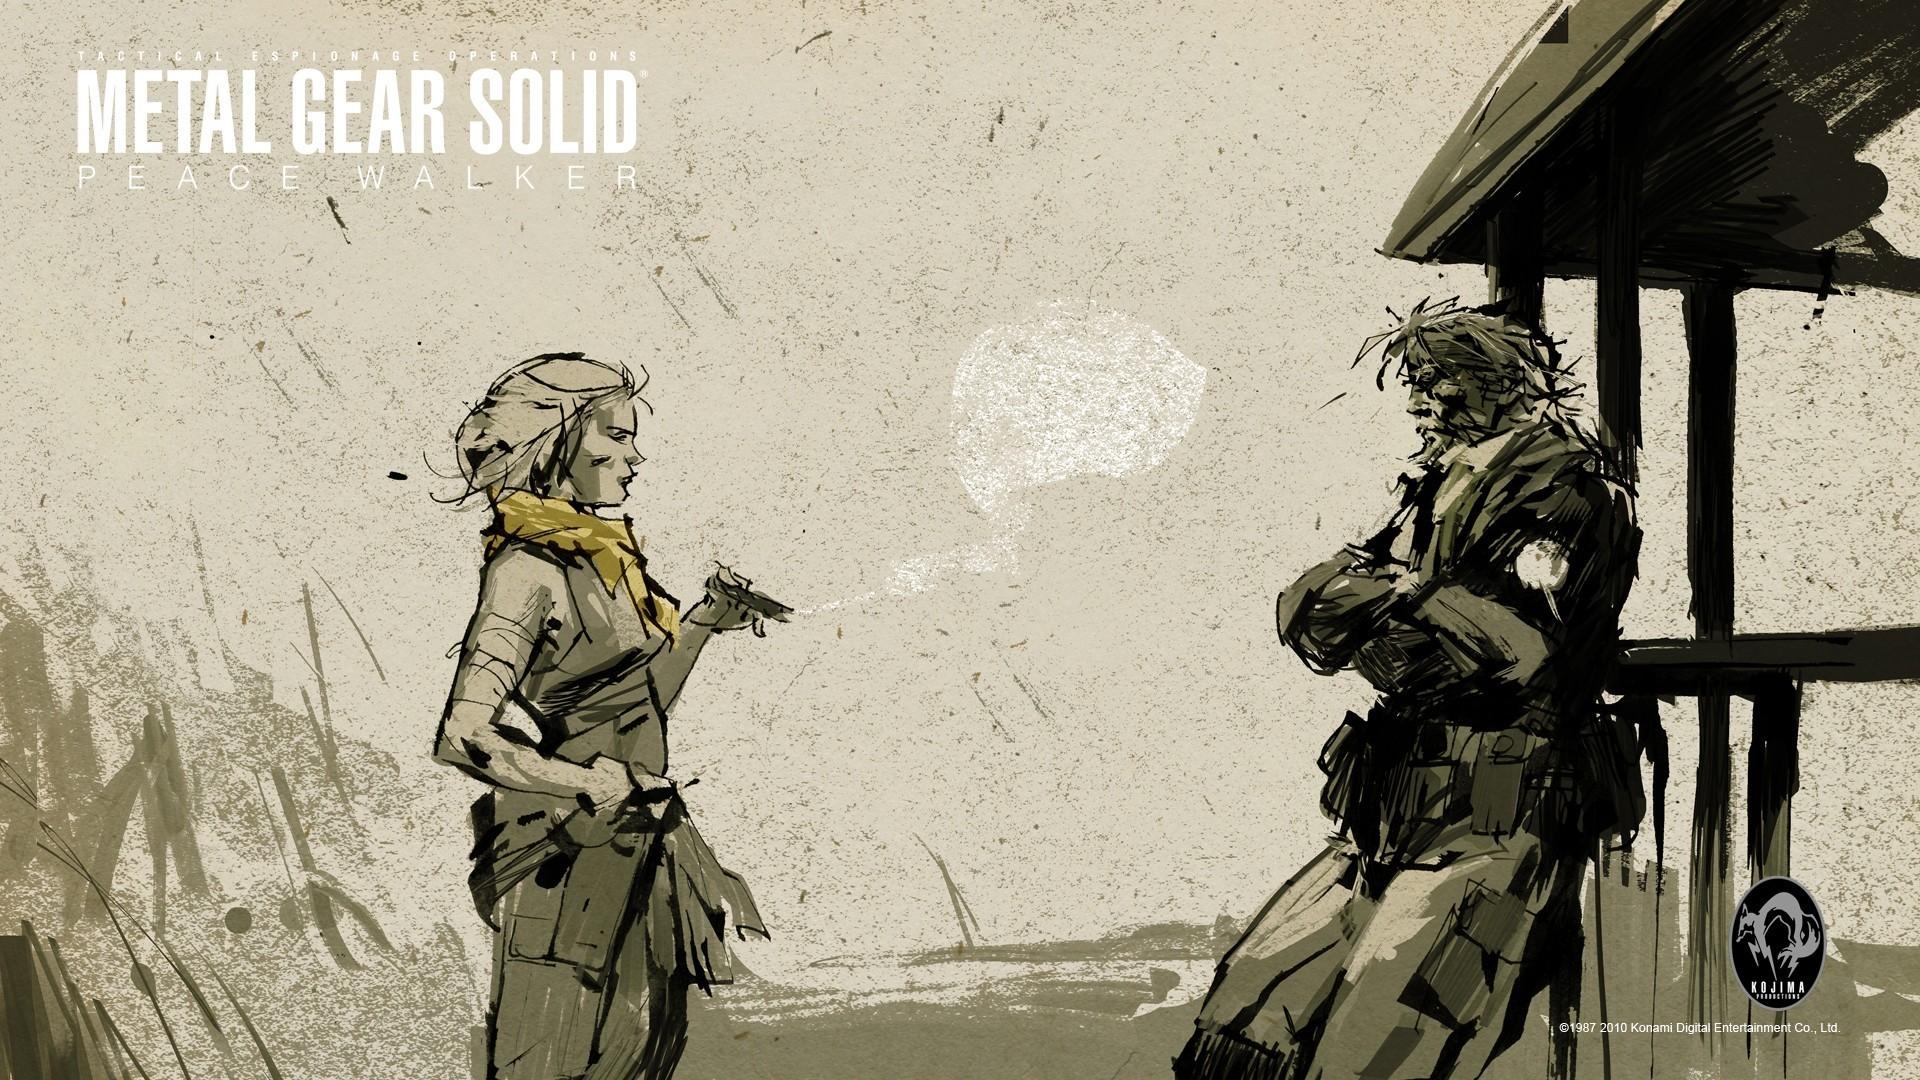 Metal Gear Solid 2 Wallpaper: Metal Gear Solid HD Wallpapers (66+ Images